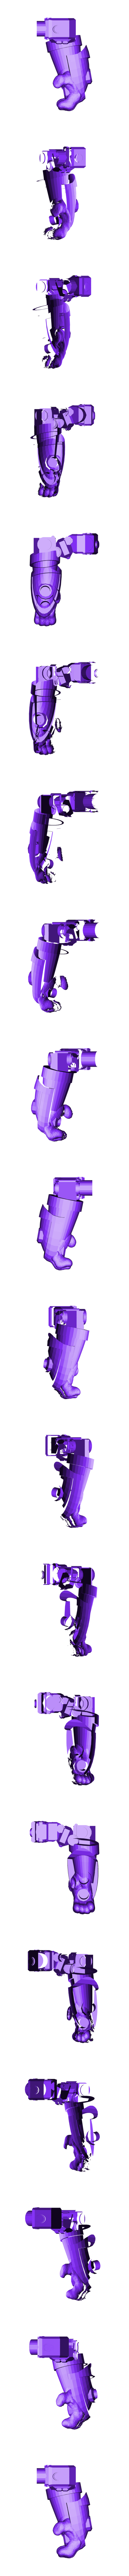 Steam_Right_Arm.stl Download free STL file Modular Mech SteamPunk • Design to 3D print, mrhers2